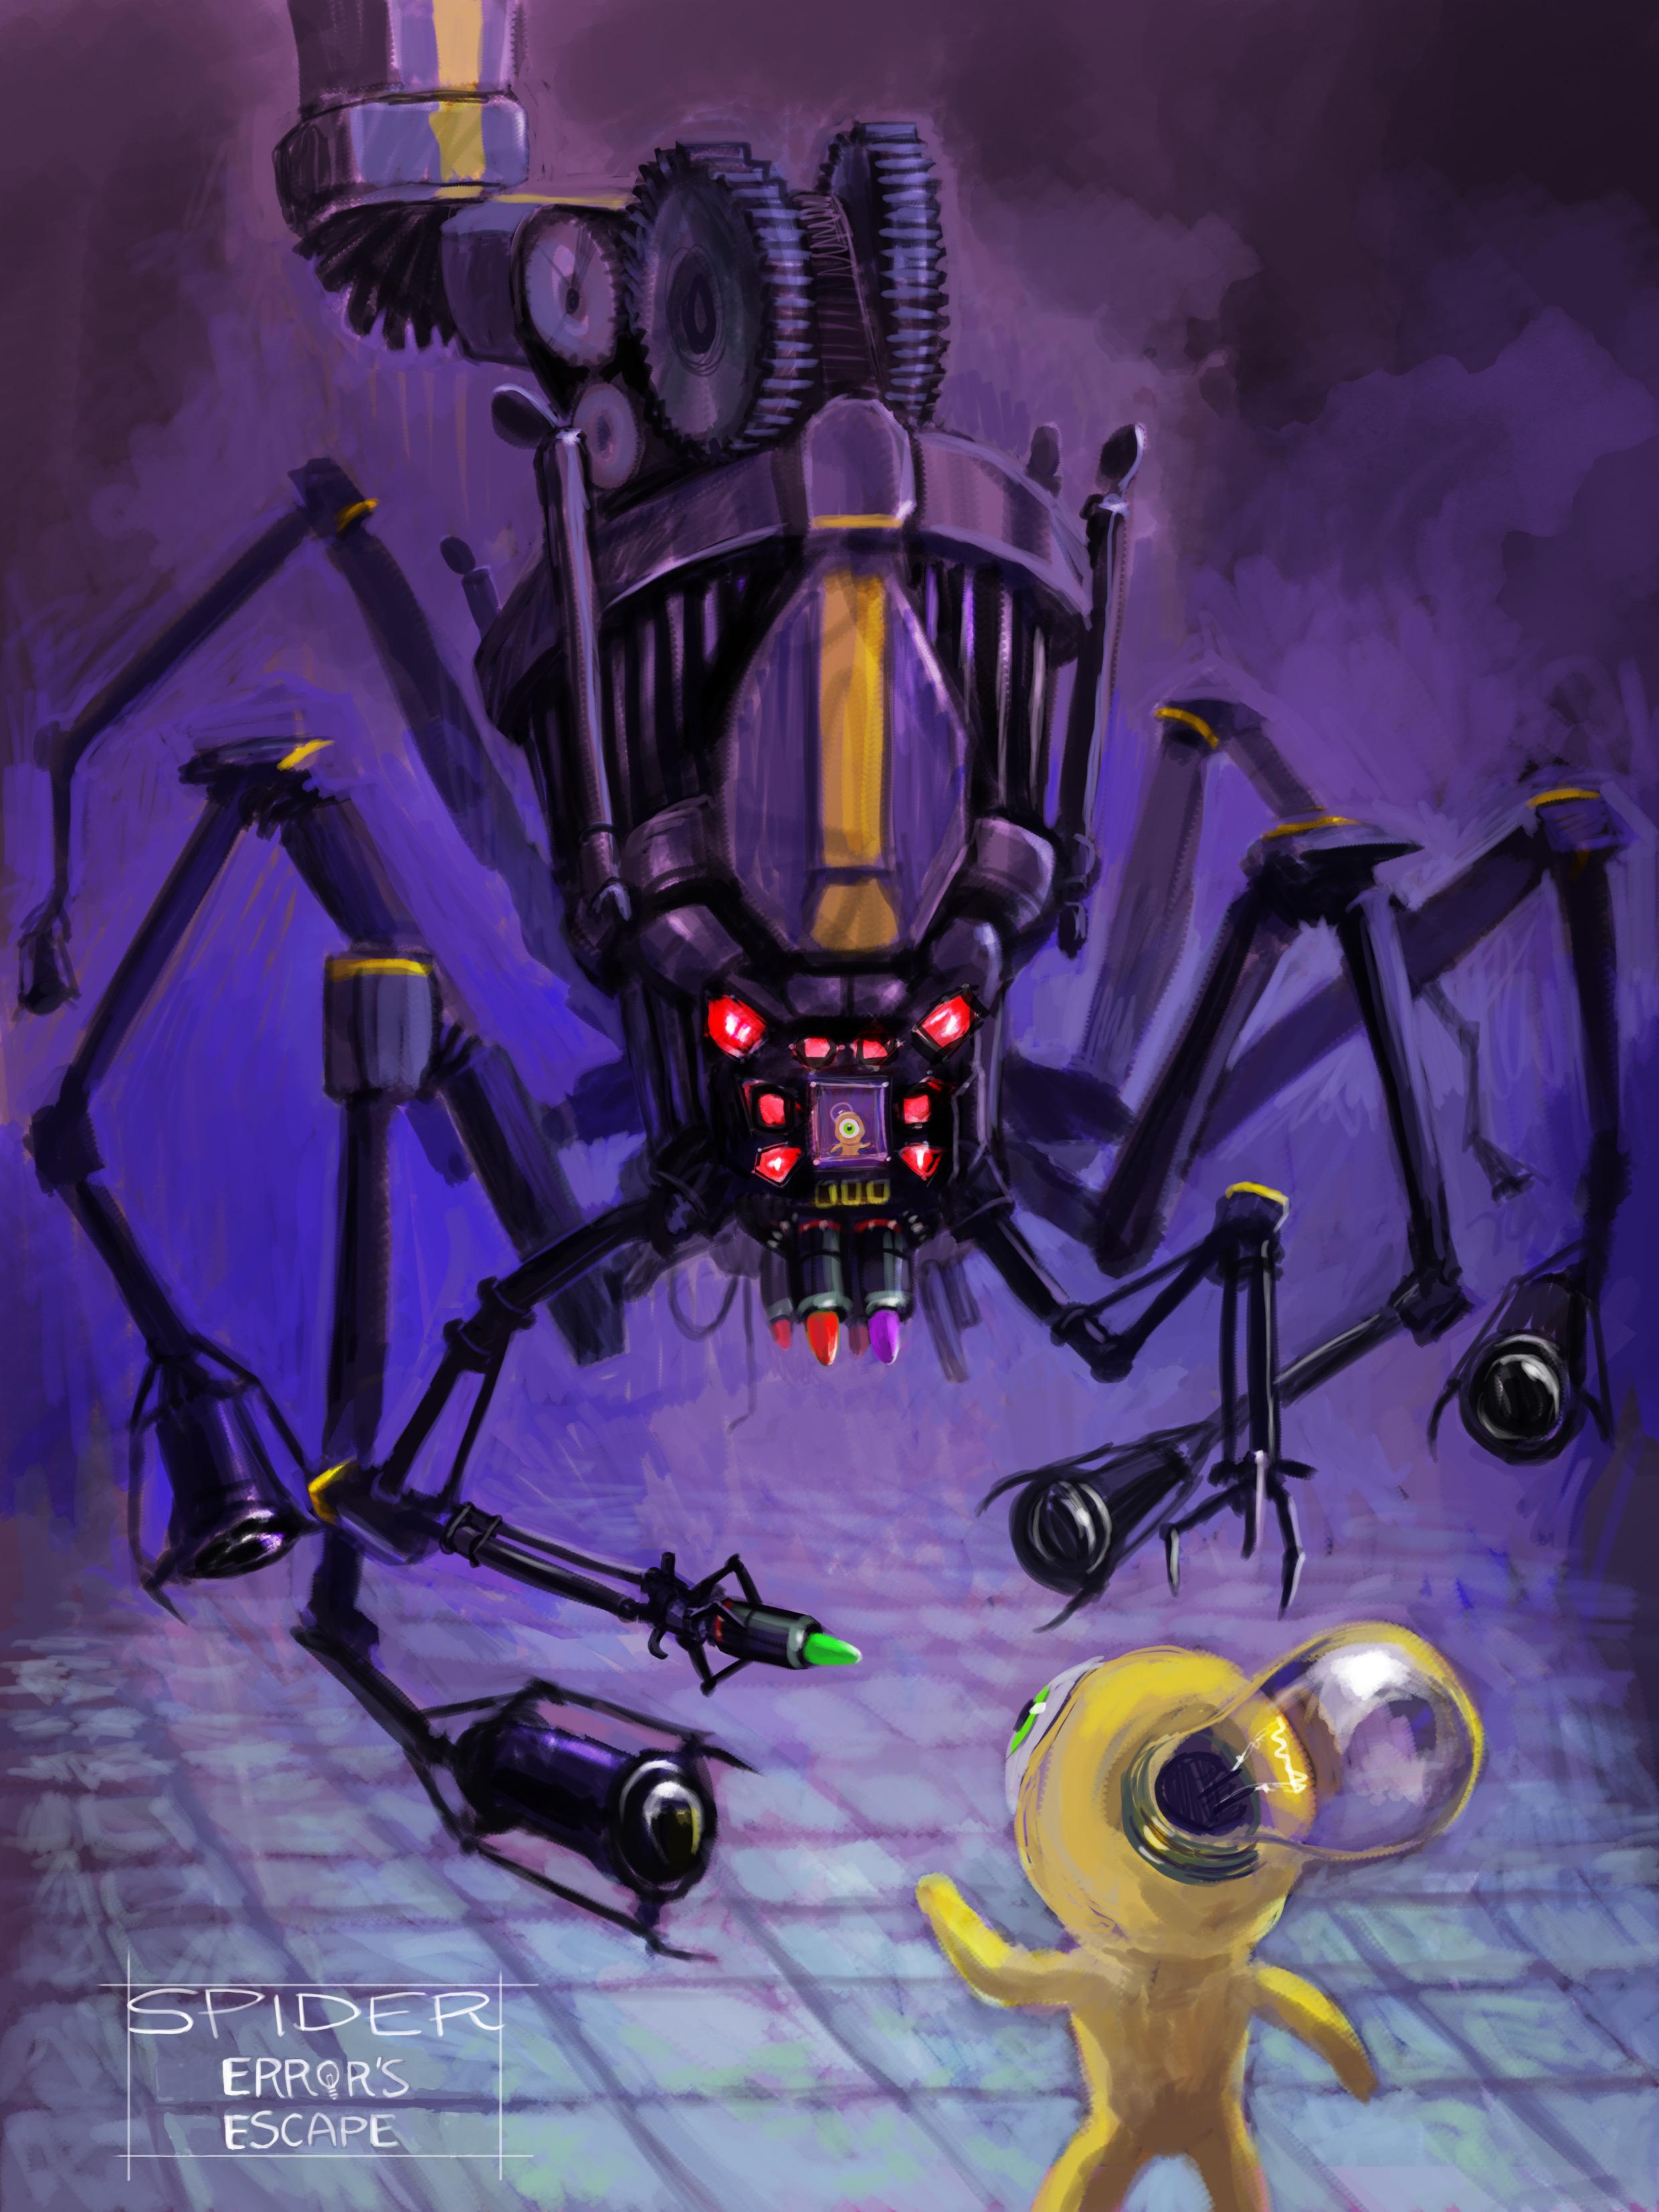 spider_error's_escape.jpg